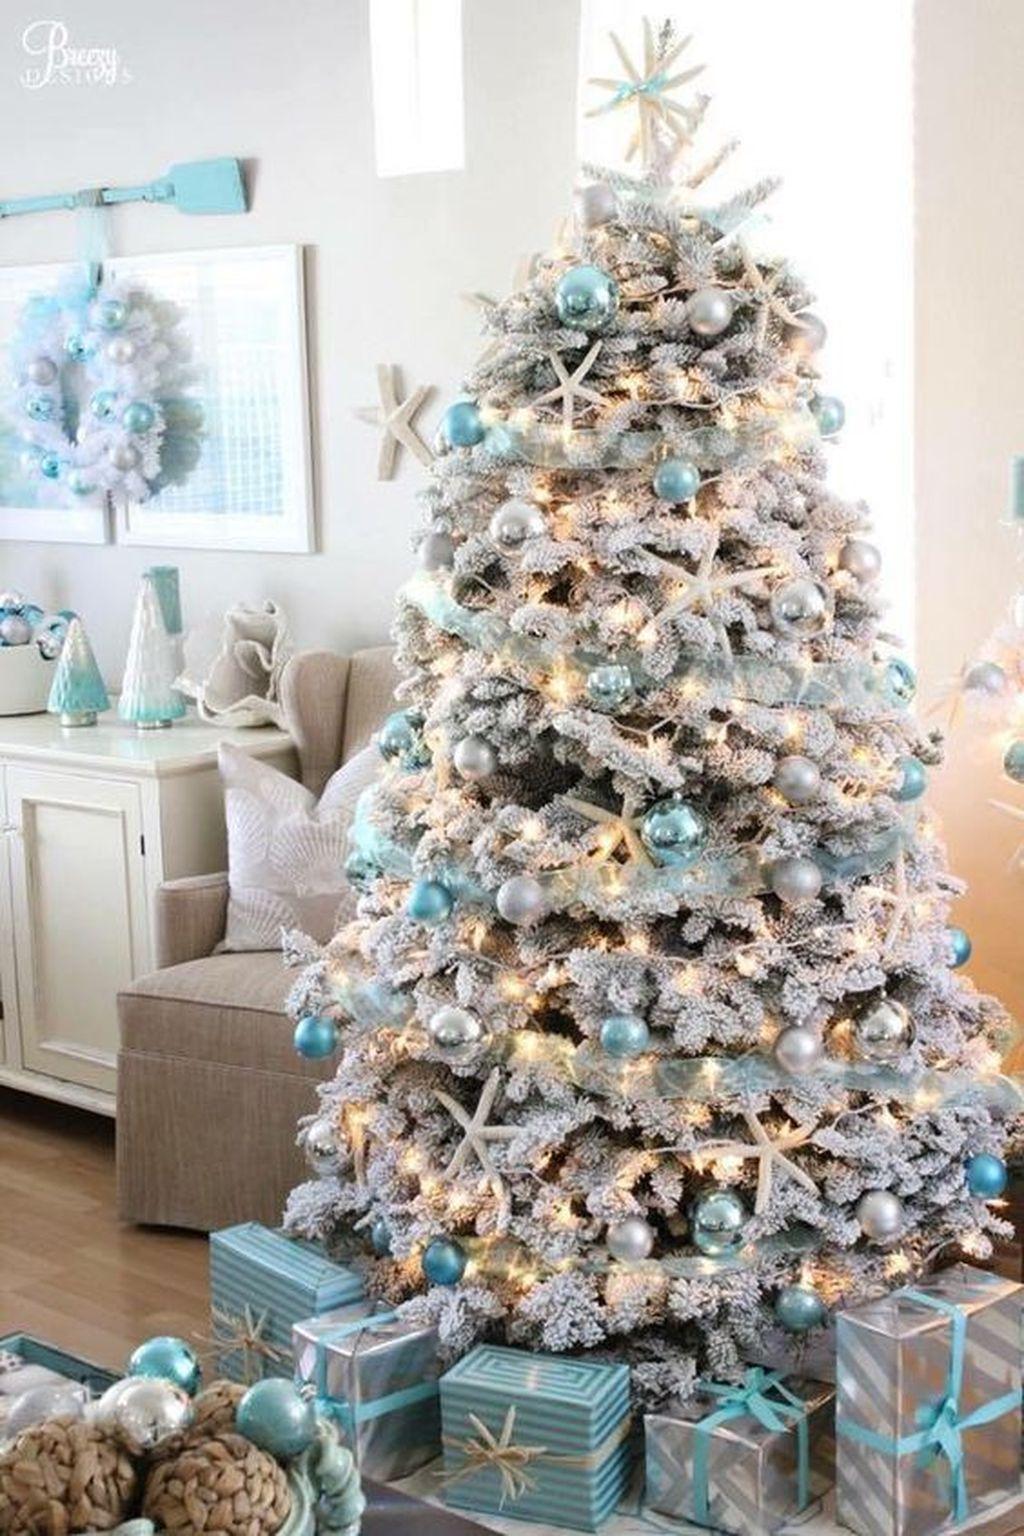 13 White Christmas Tree Decorating Ideas | Van interior